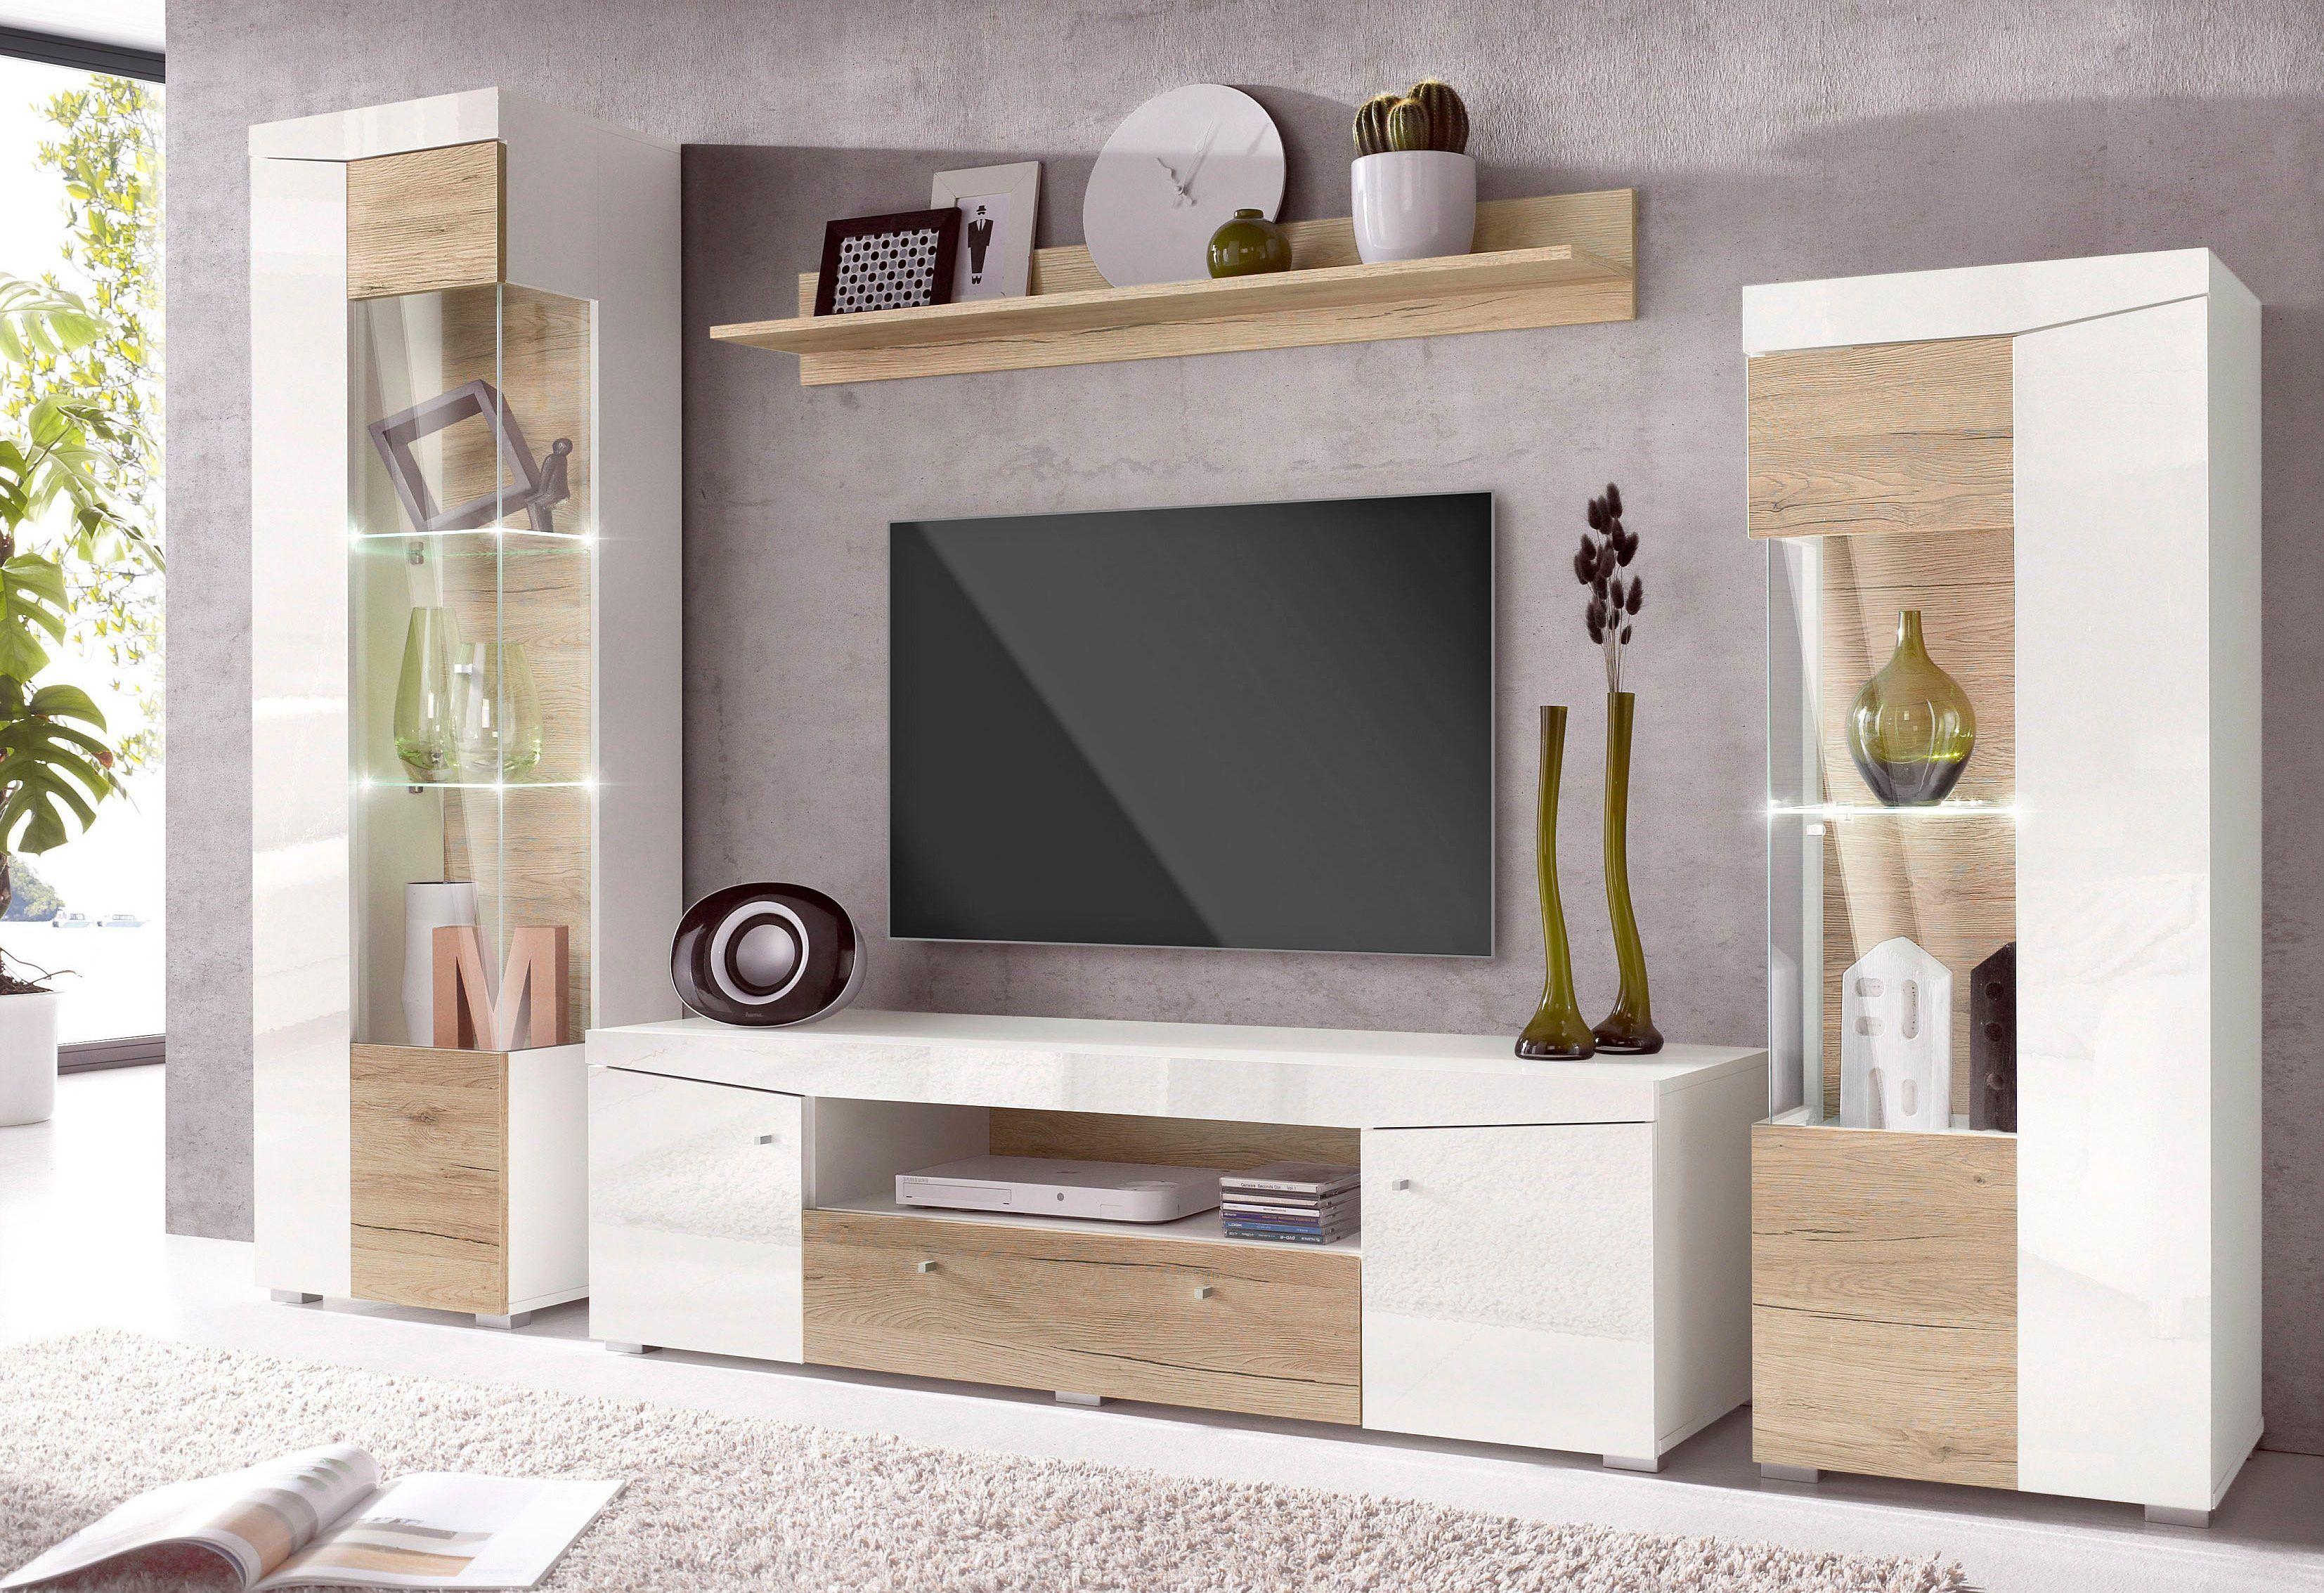 Wohnwand Beige Pflegeleichte Oberflache Hochglanz Fronten Fsc Zertifiziert Yourhome Jetzt Bestel Living Room Designs Living Room Tv Wall Tv Unit Furniture